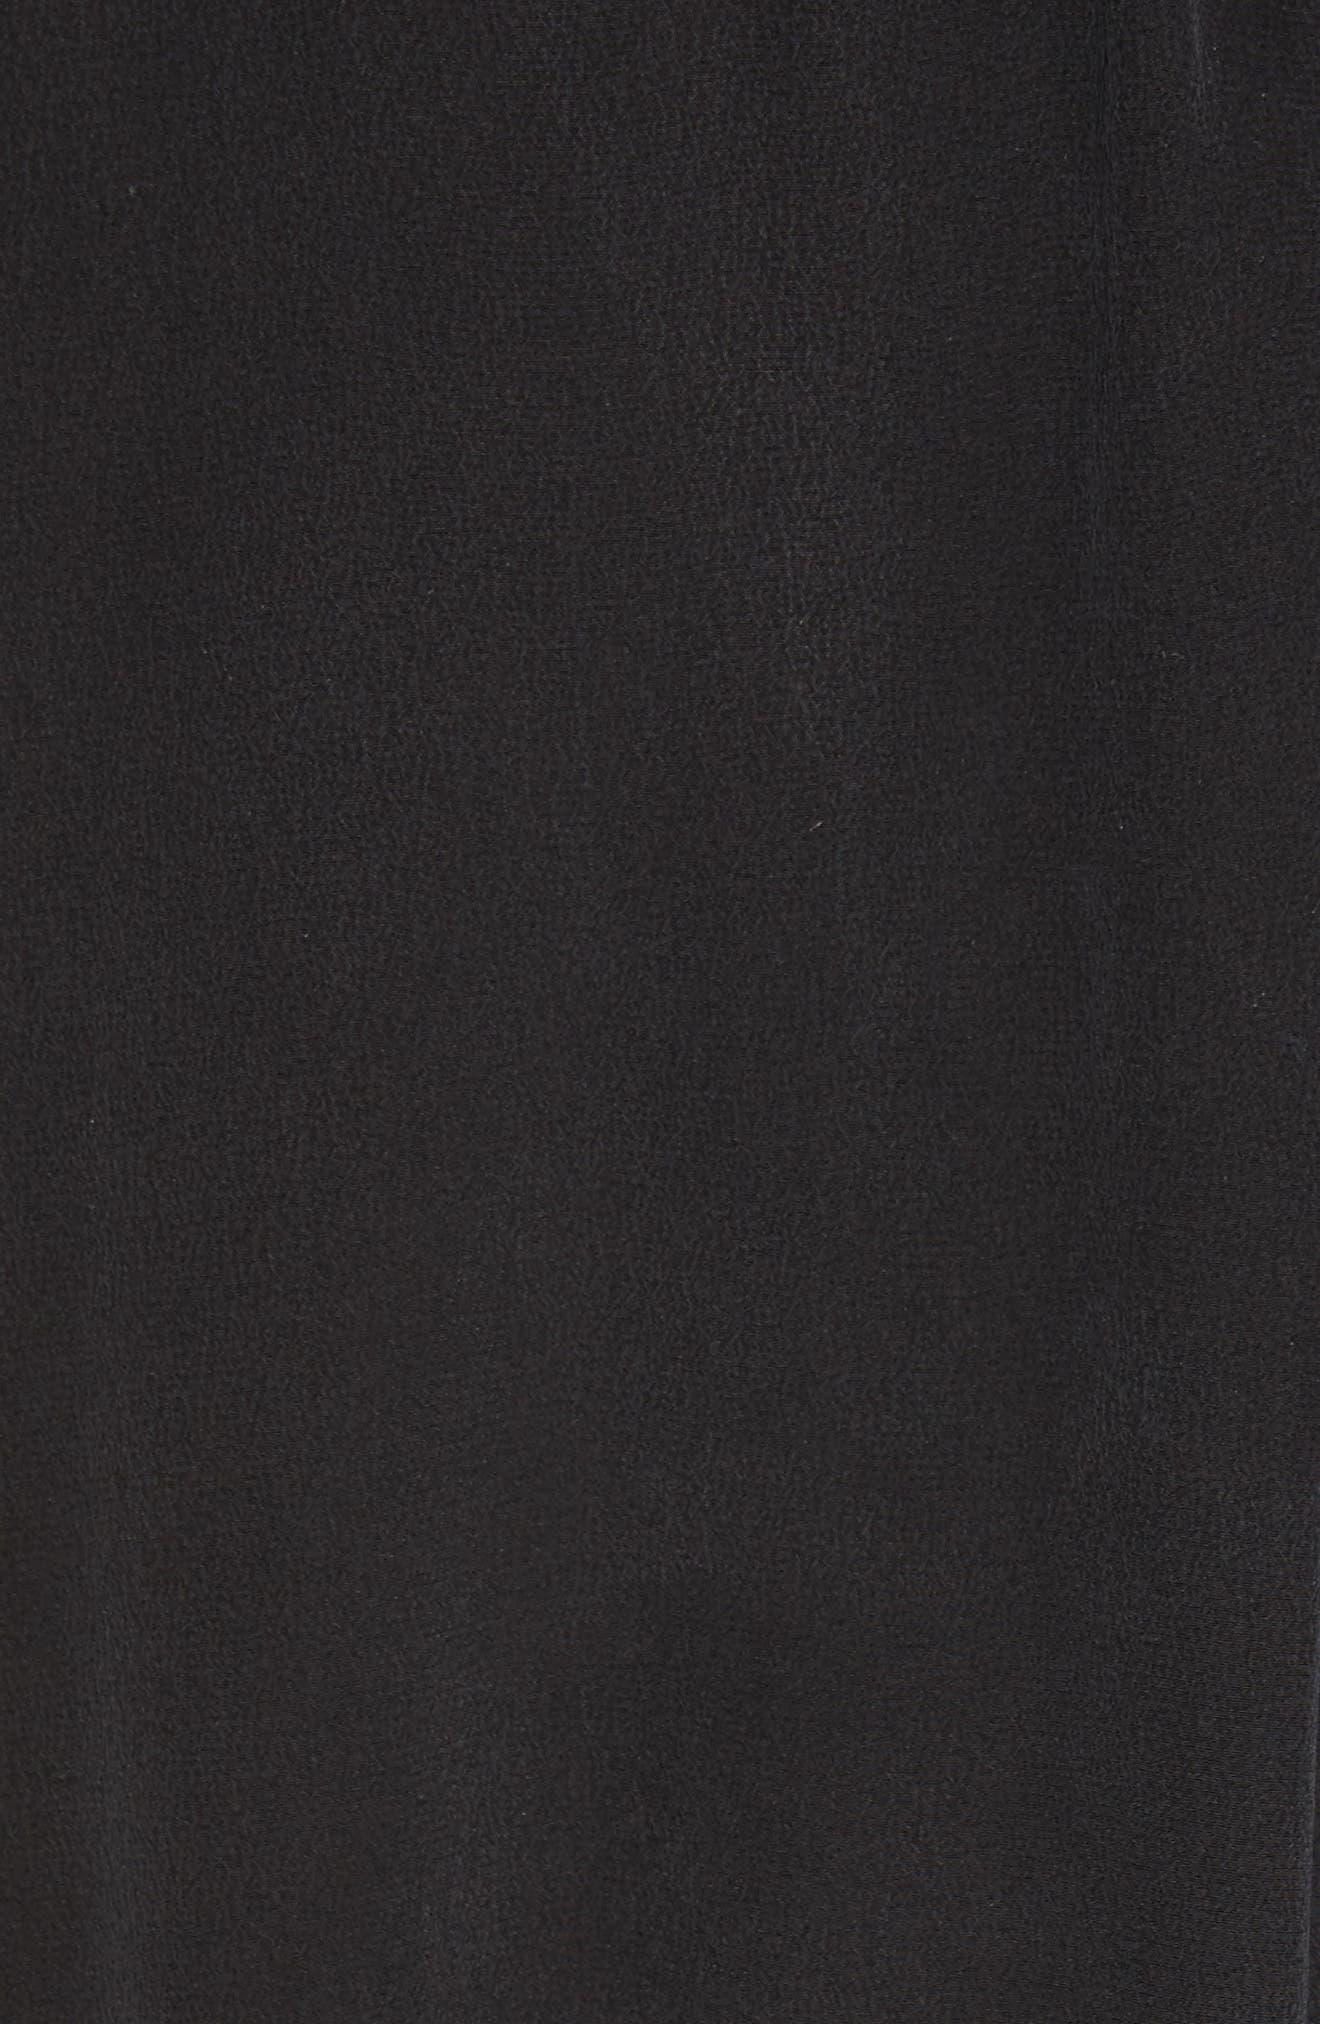 Shirred Sleeve Silk Dress,                             Alternate thumbnail 5, color,                             Black